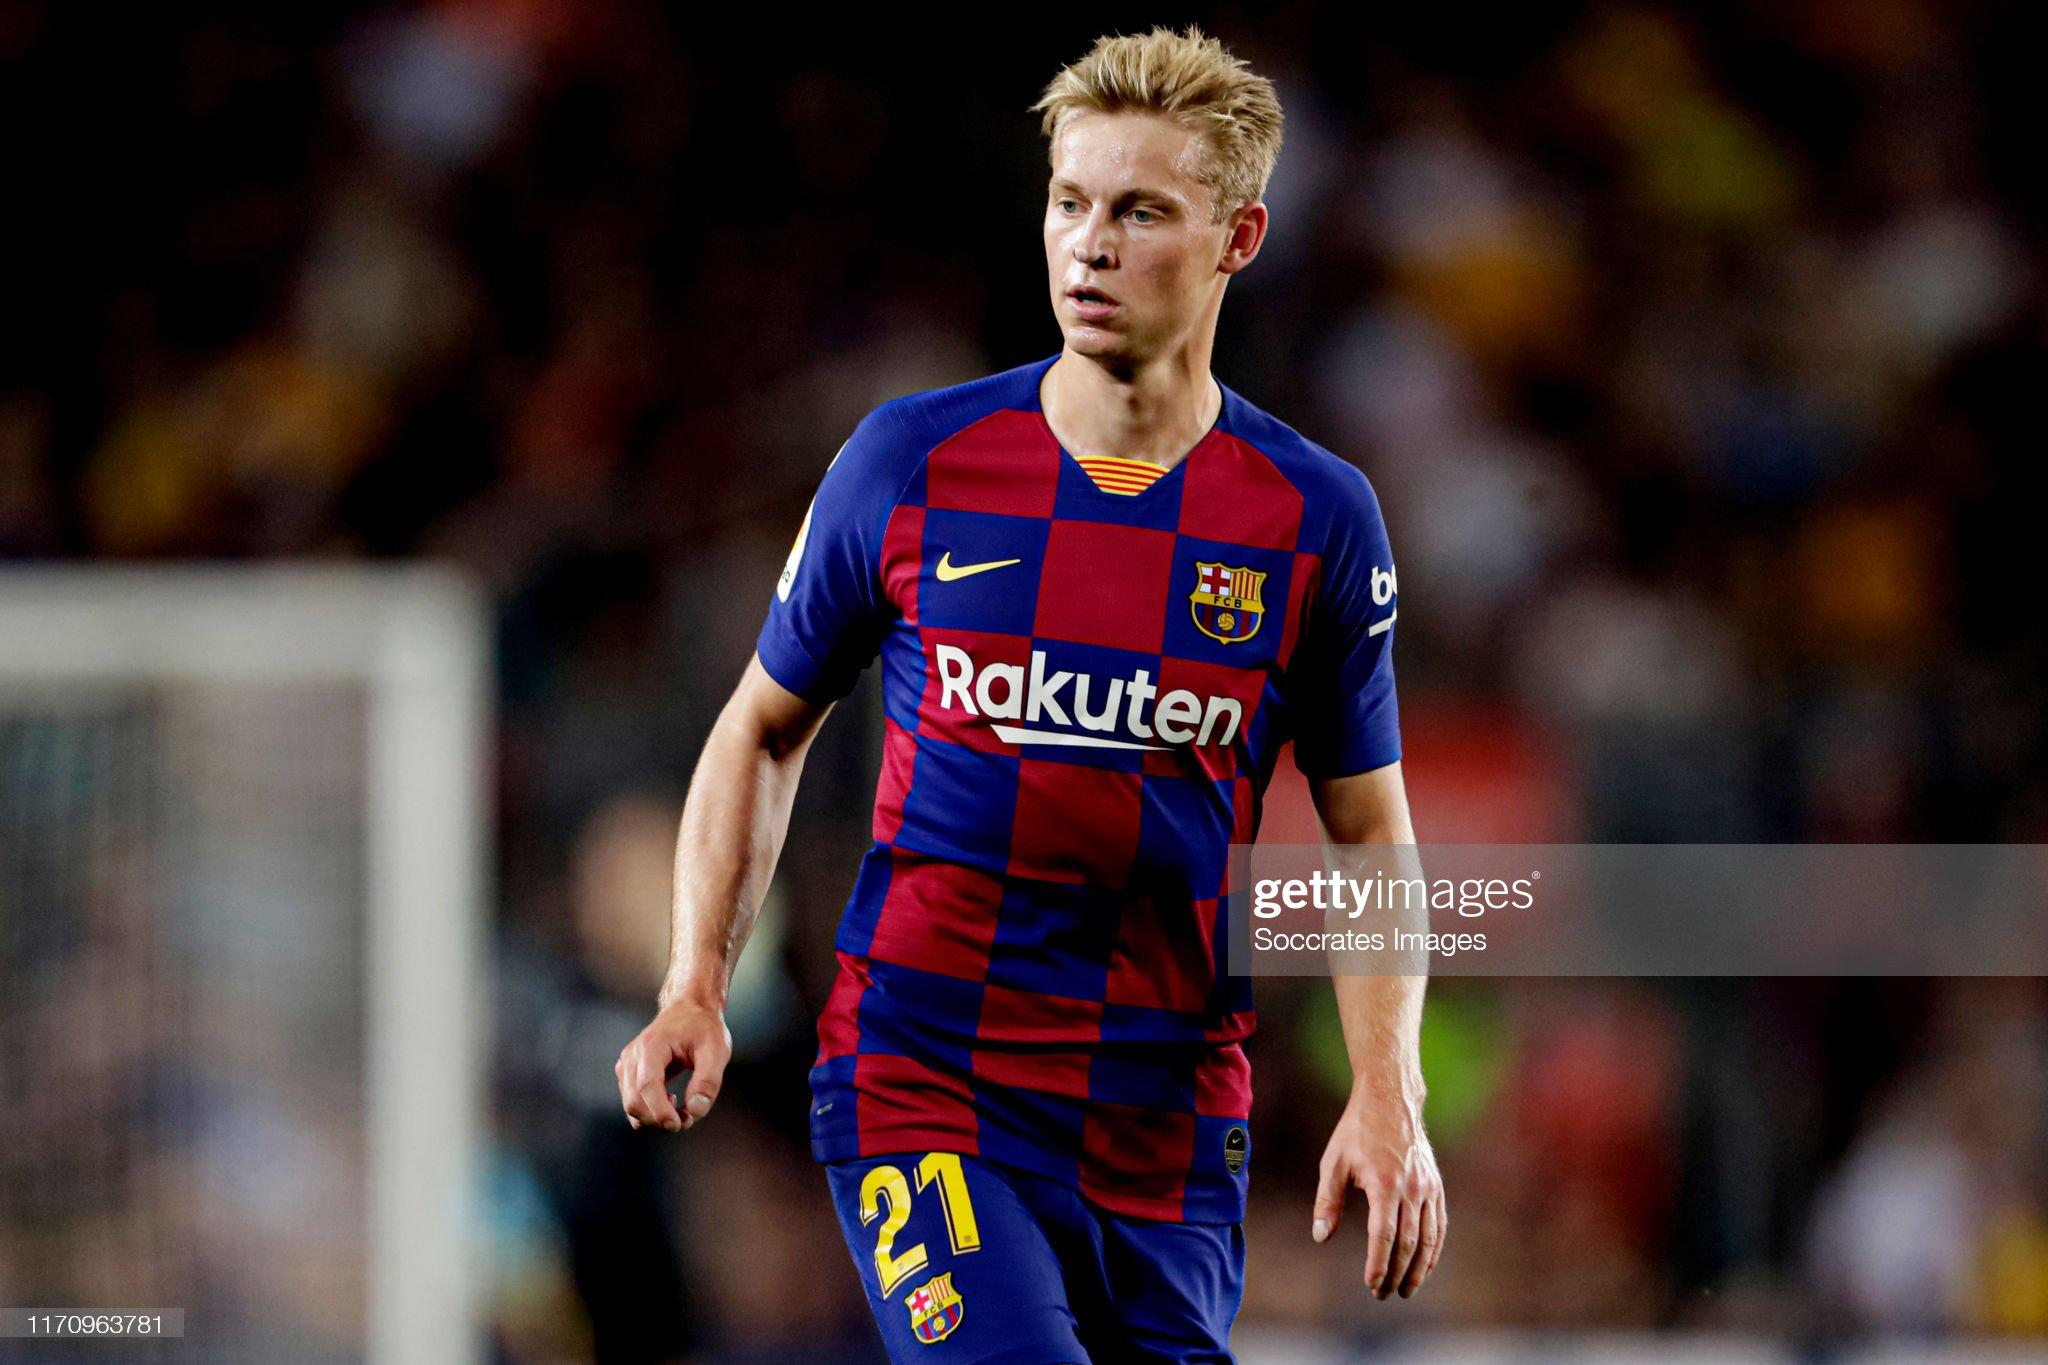 صور مباراة : برشلونة - فياريال 2-1 ( 24-09-2019 )  Frenkie-de-jong-of-fc-barcelona-during-the-la-liga-santander-match-picture-id1170963781?s=2048x2048